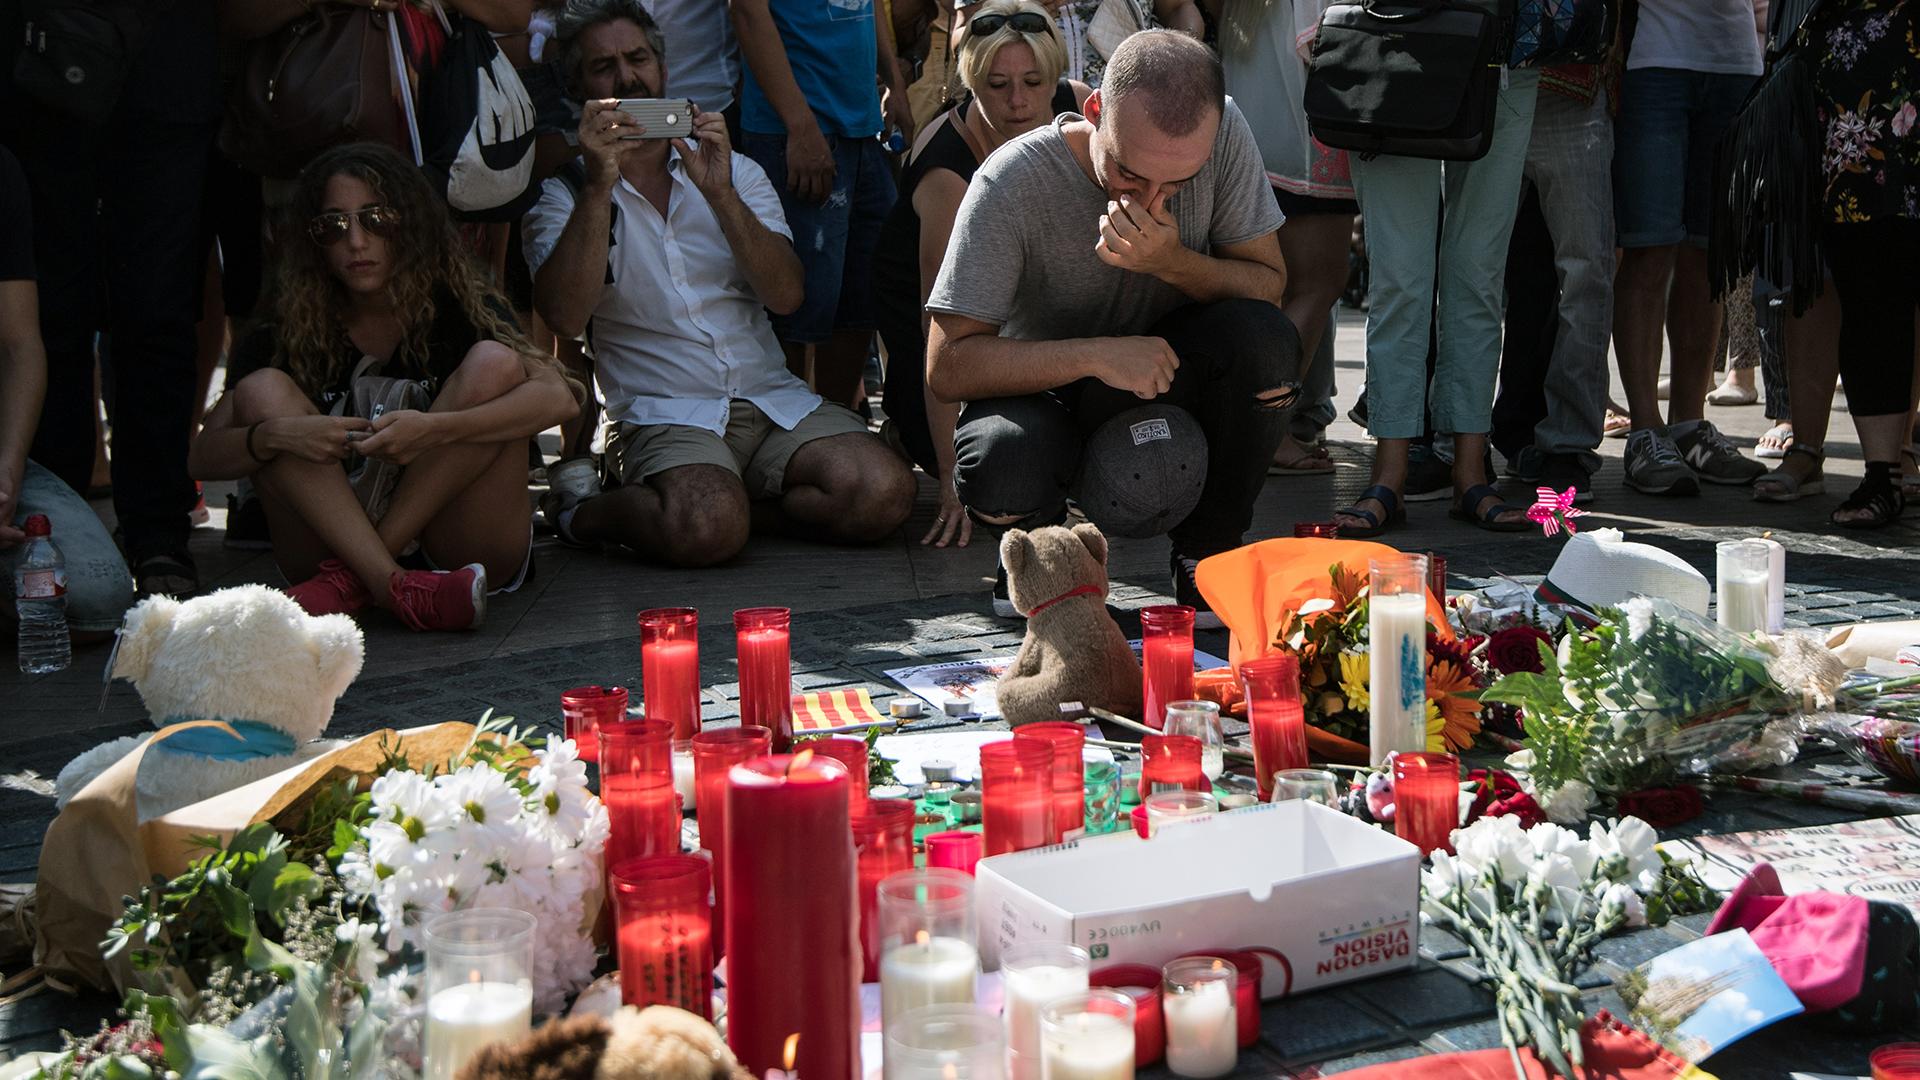 Barcelona van attack Memorial-159532.jpg21171751